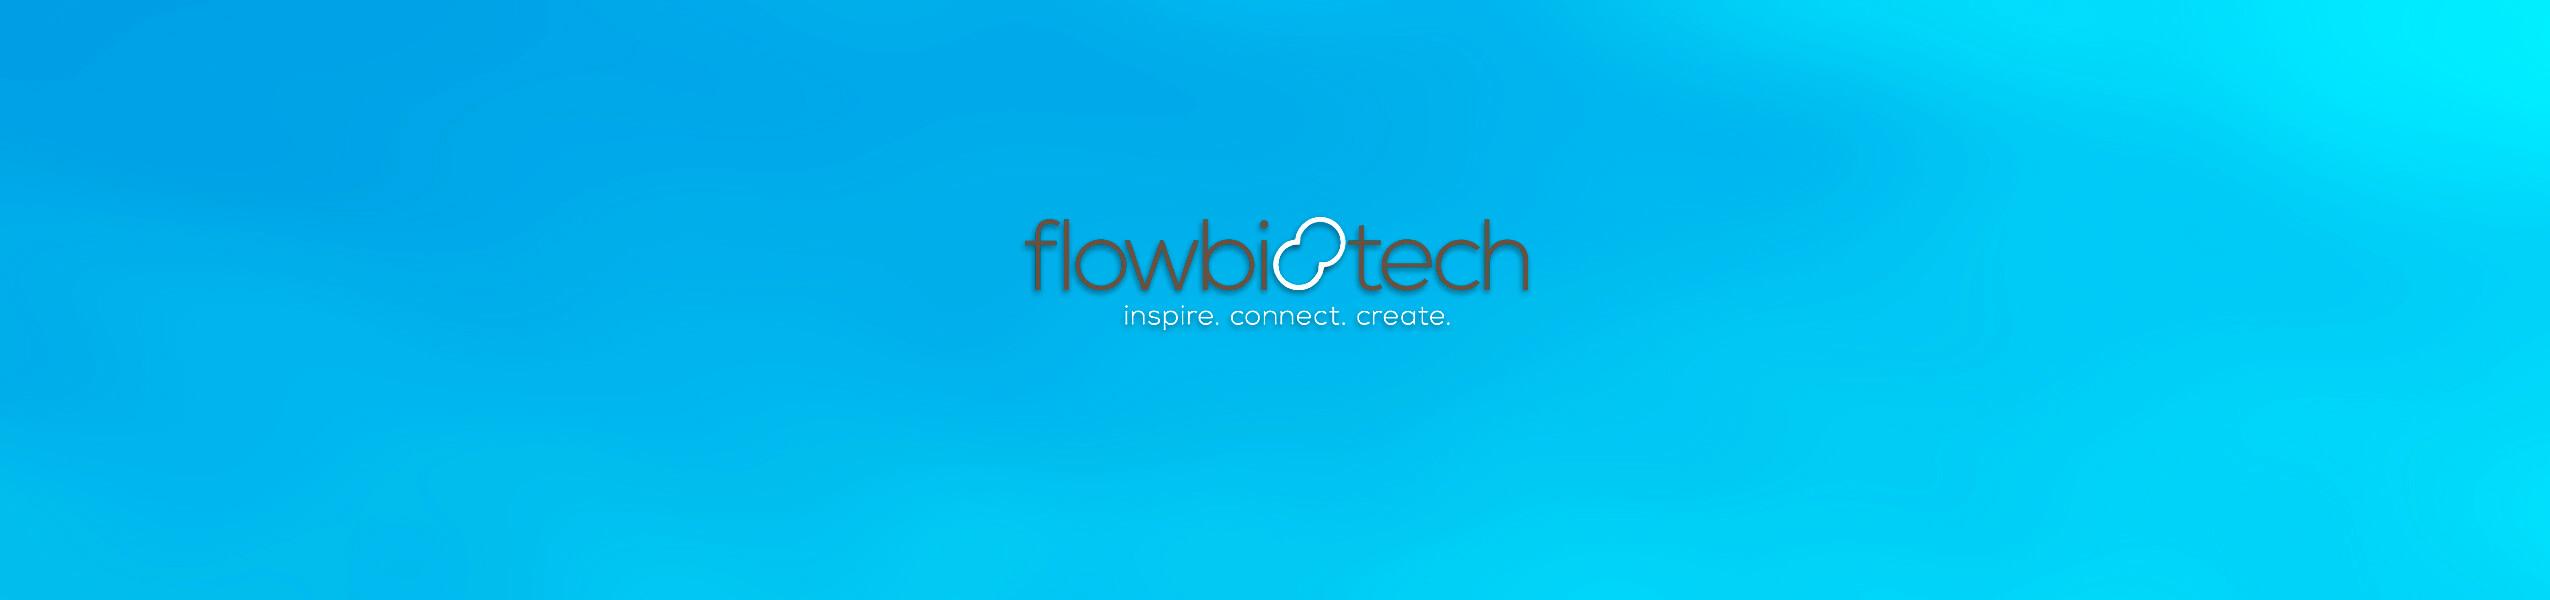 Newrtone designing You Flowbiotech project